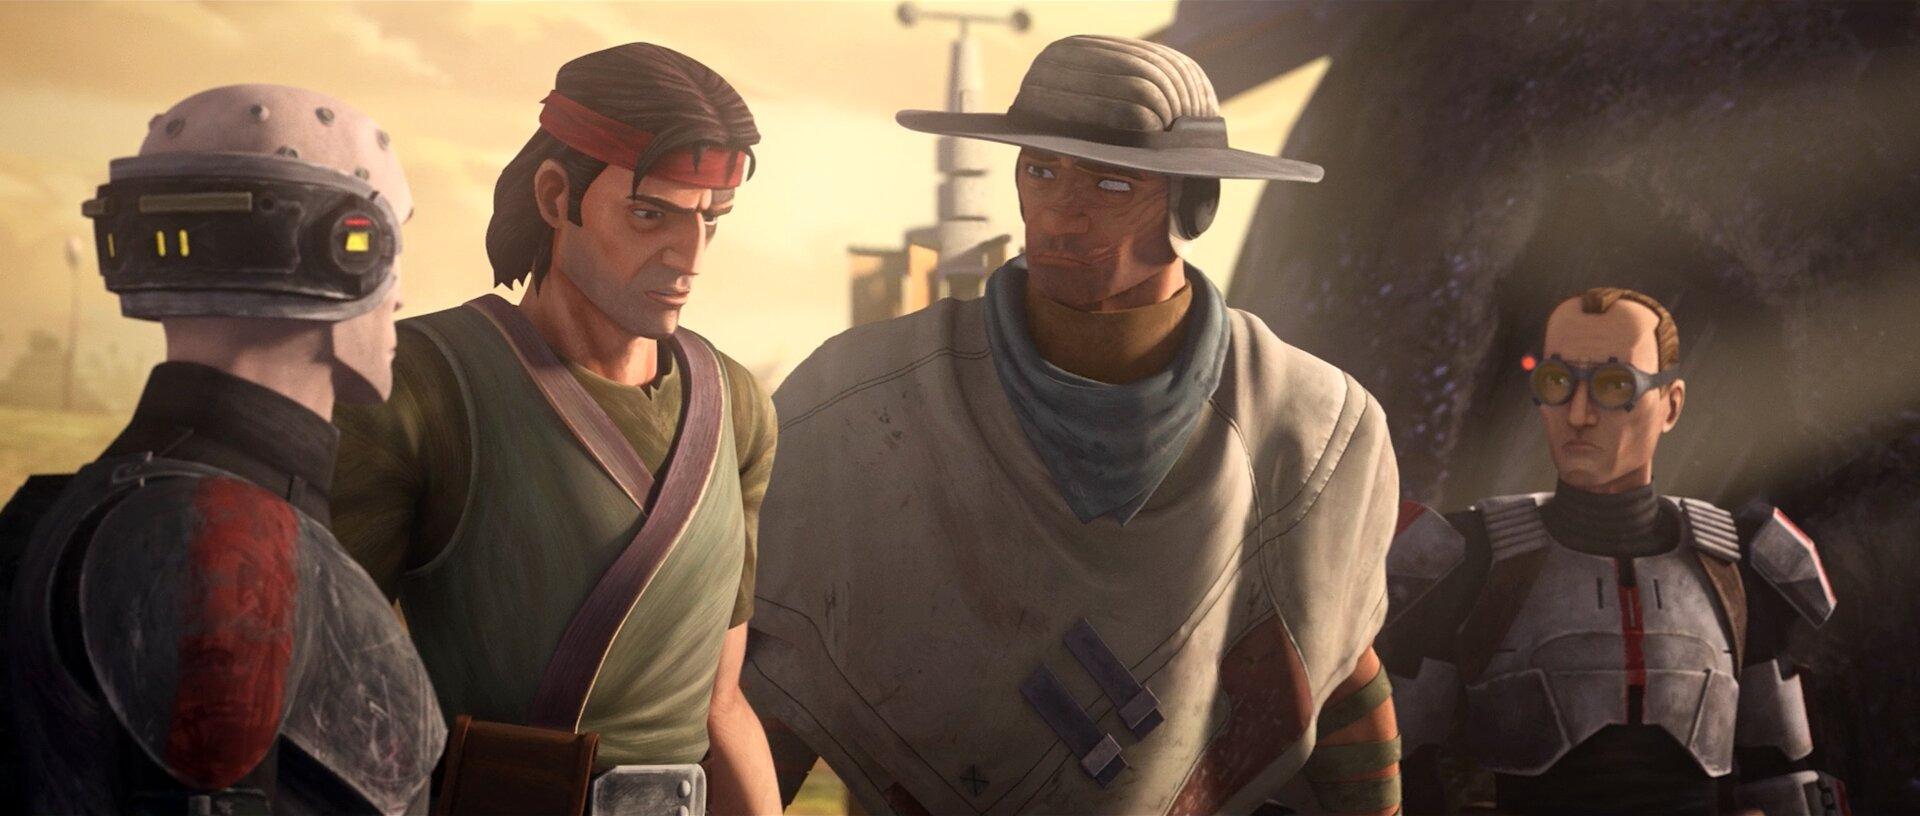 Star Wars: The Bad Batch — s01e02 — Cut and Run